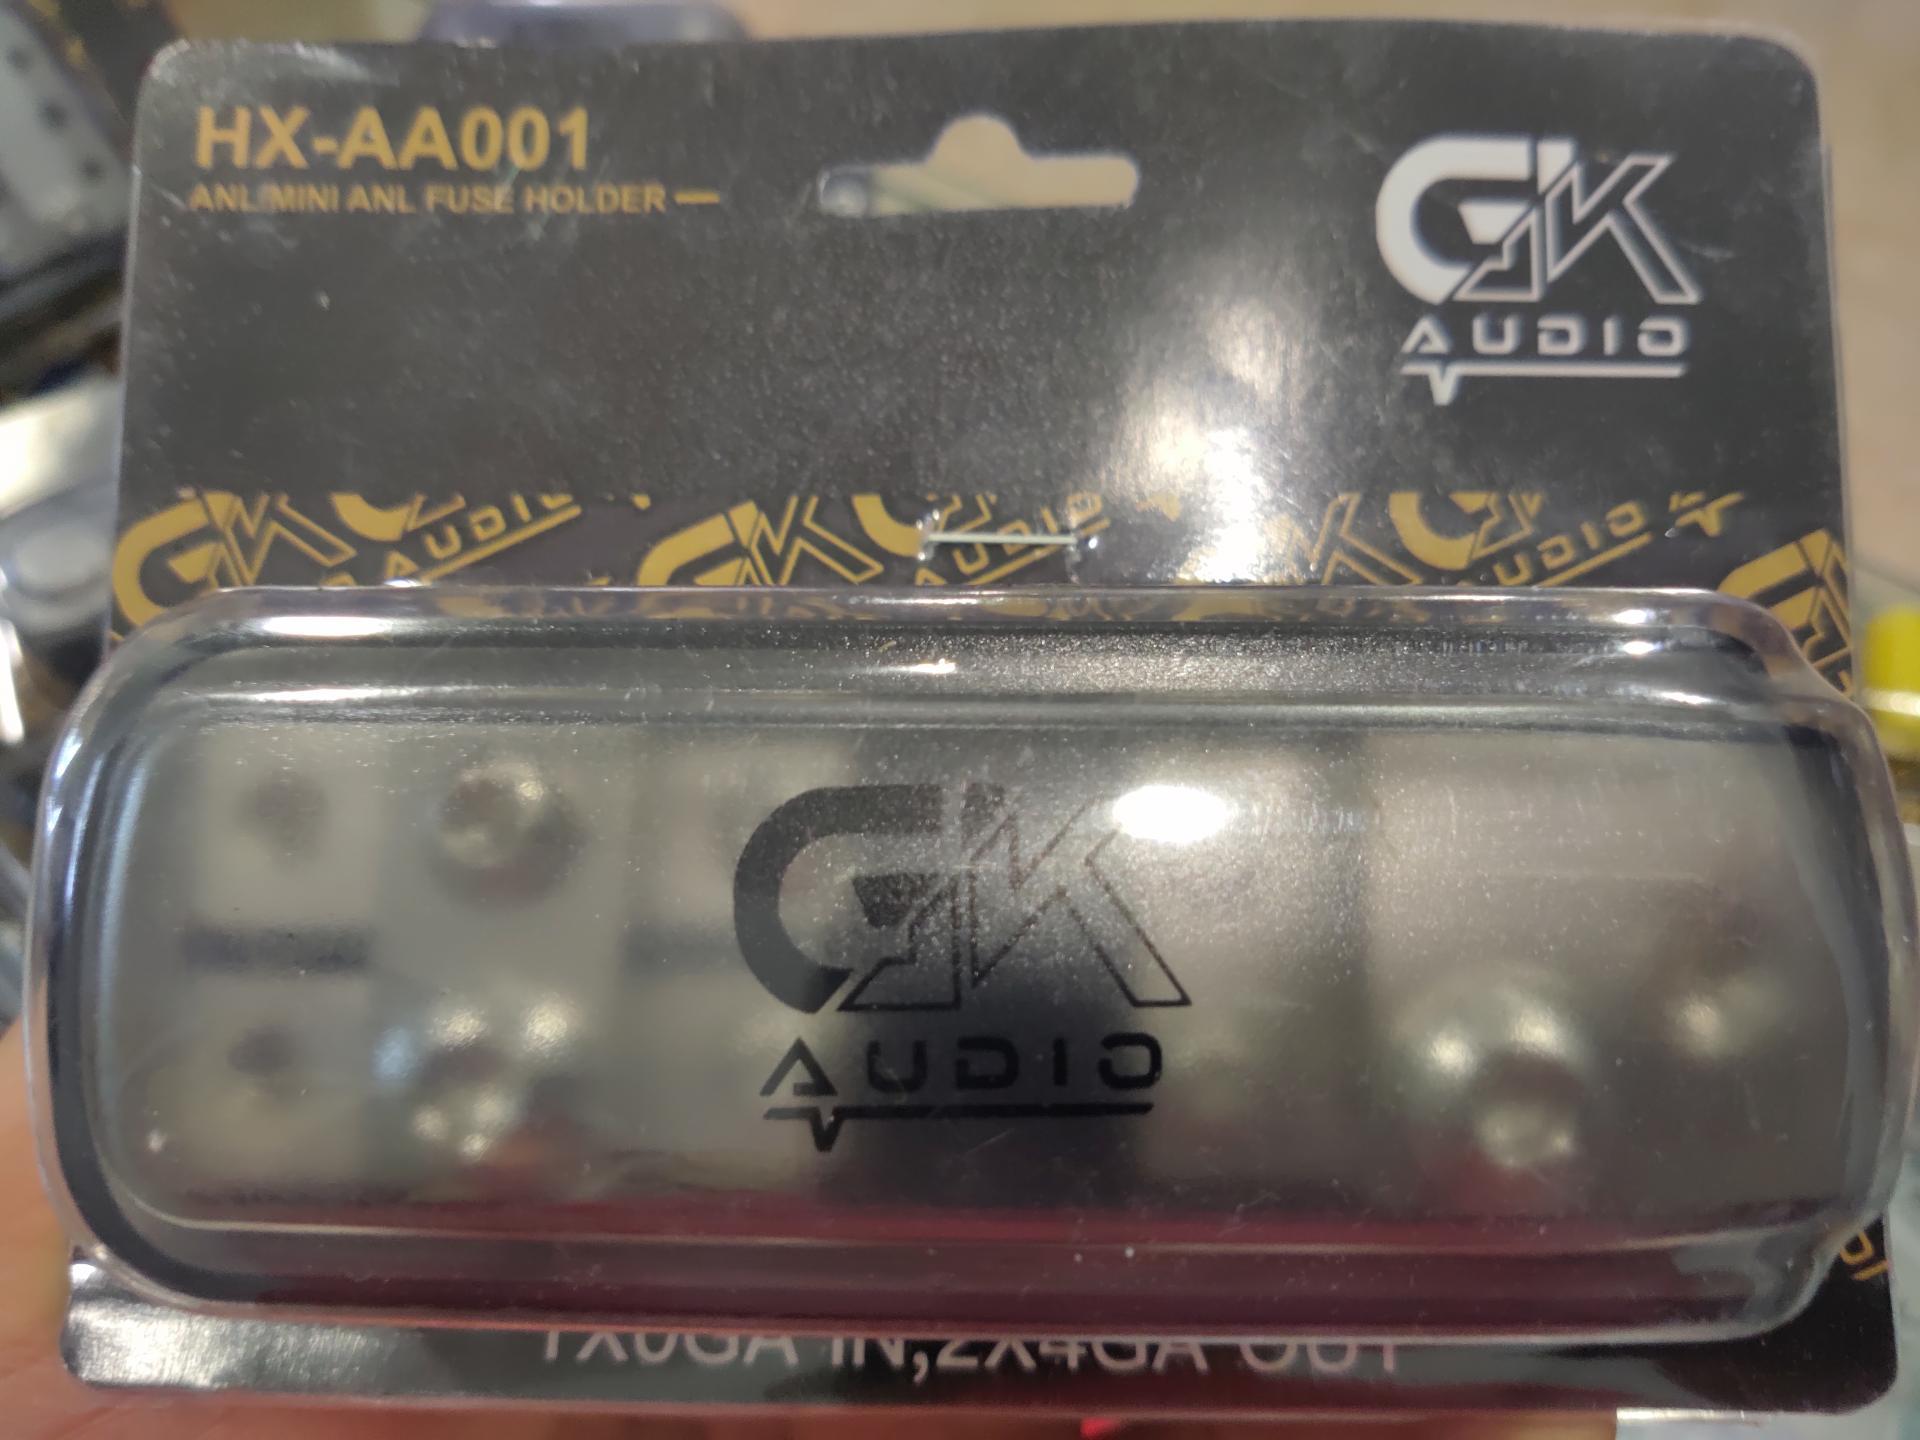 Distribuidor 1 ent 2 salidas Gk Audio